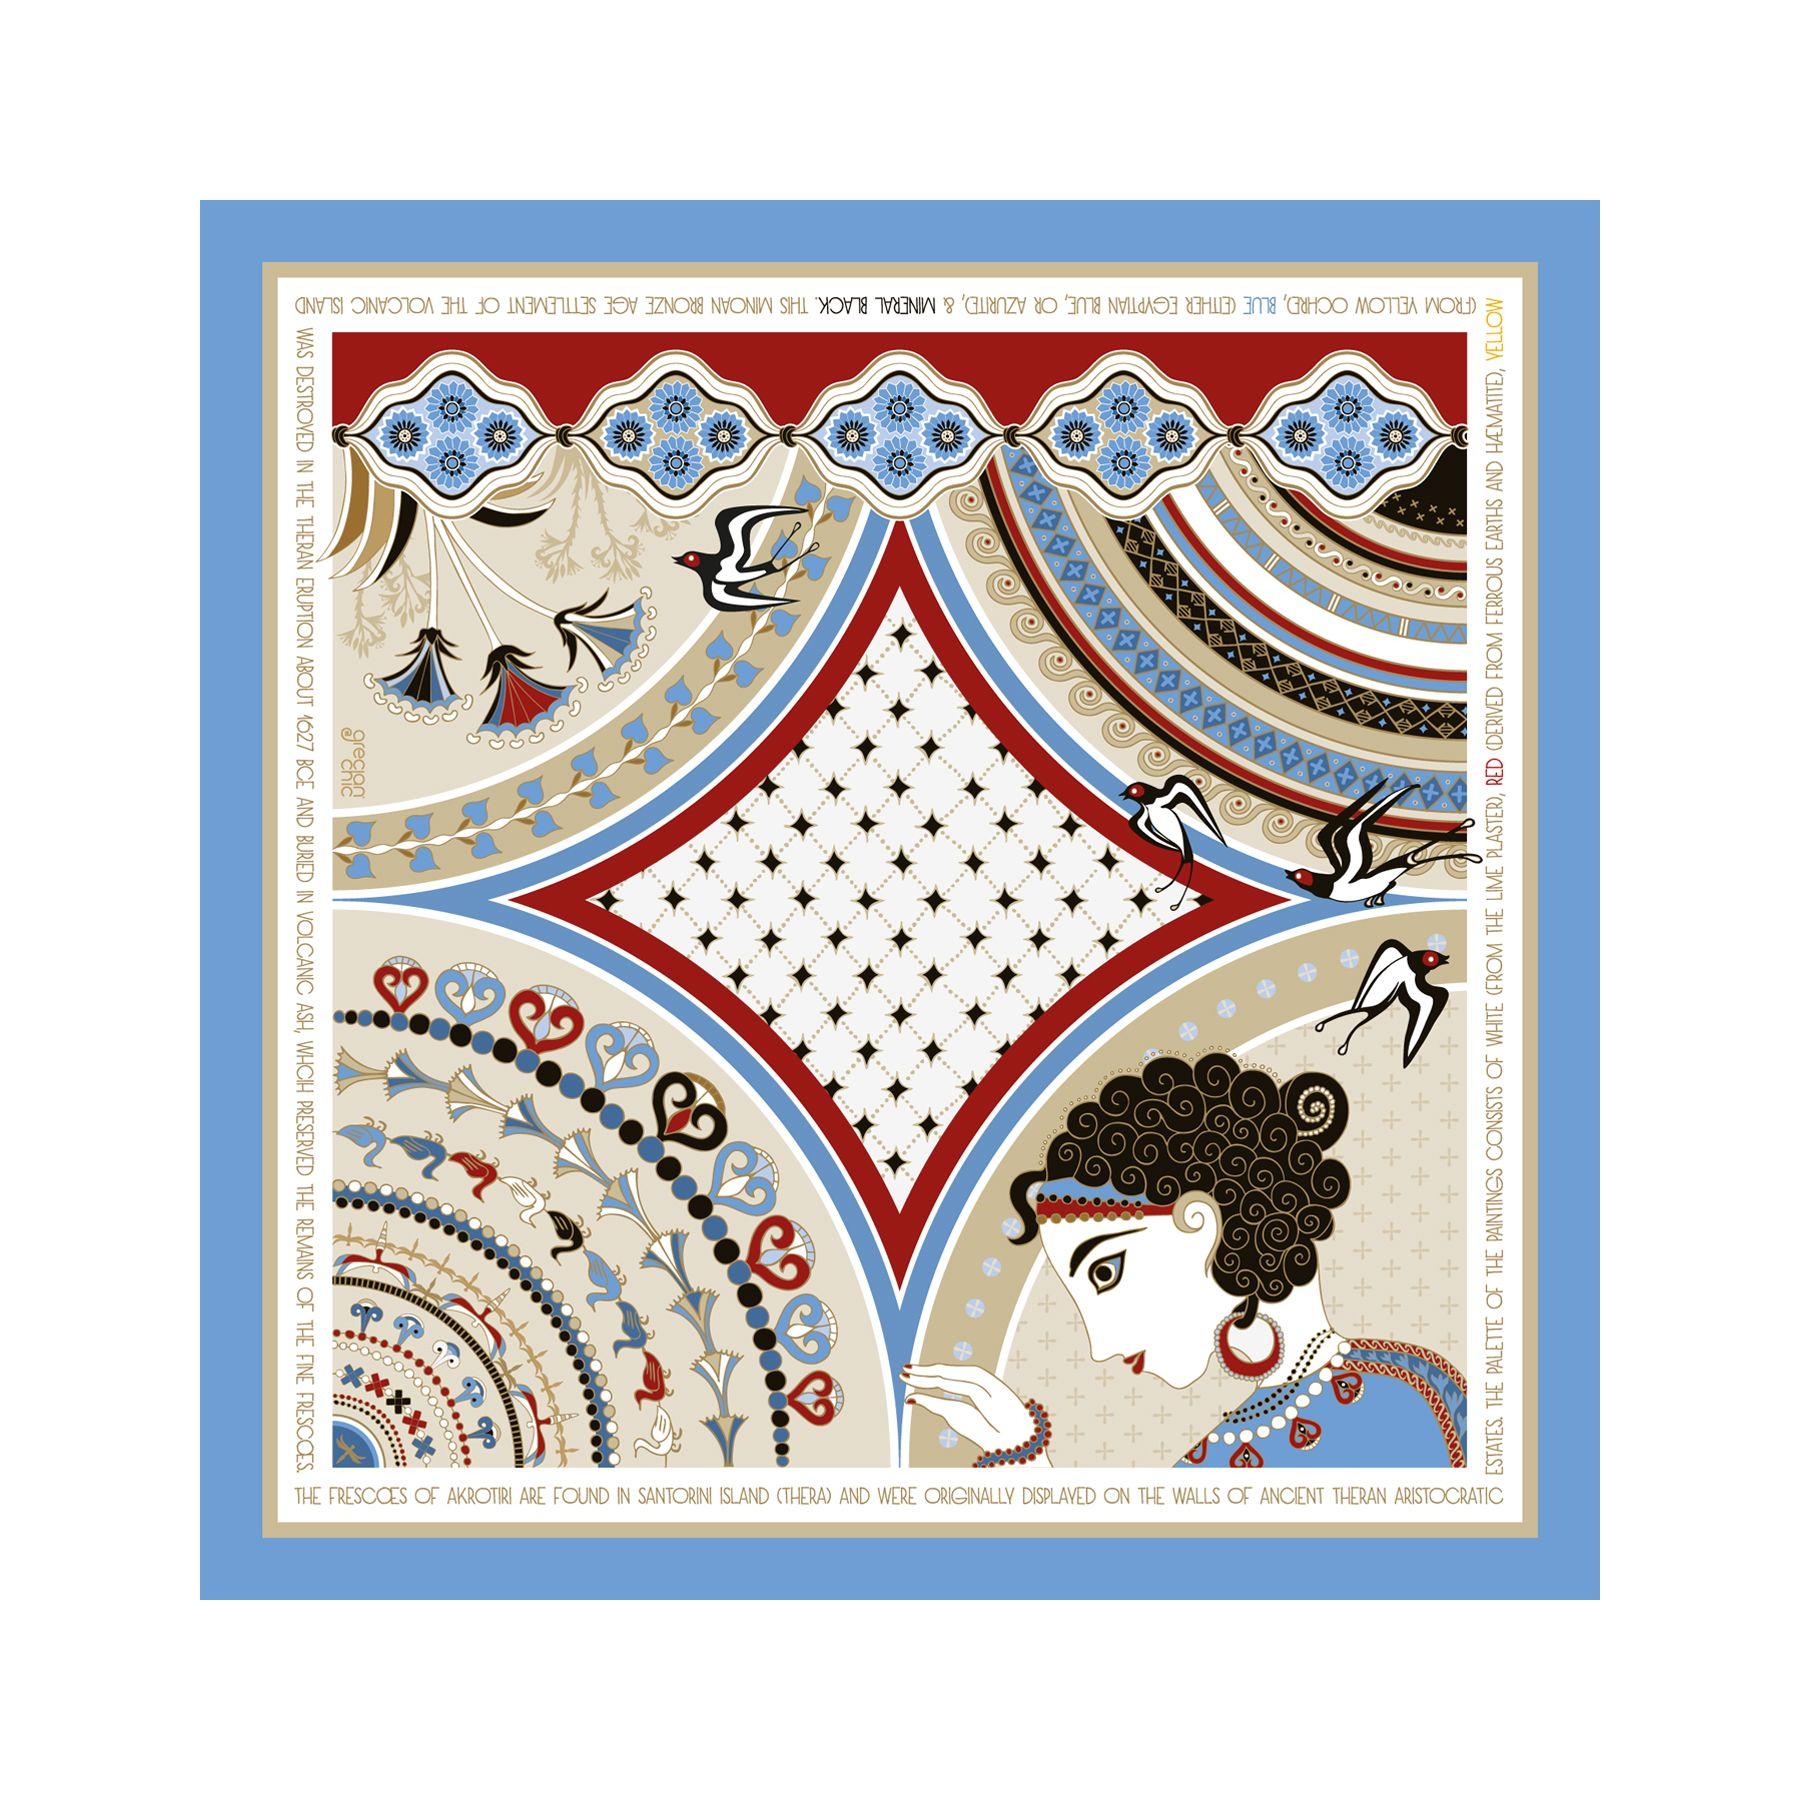 Grecian Chic | SANTORINI Silk Scarves by Elena Zournatzi